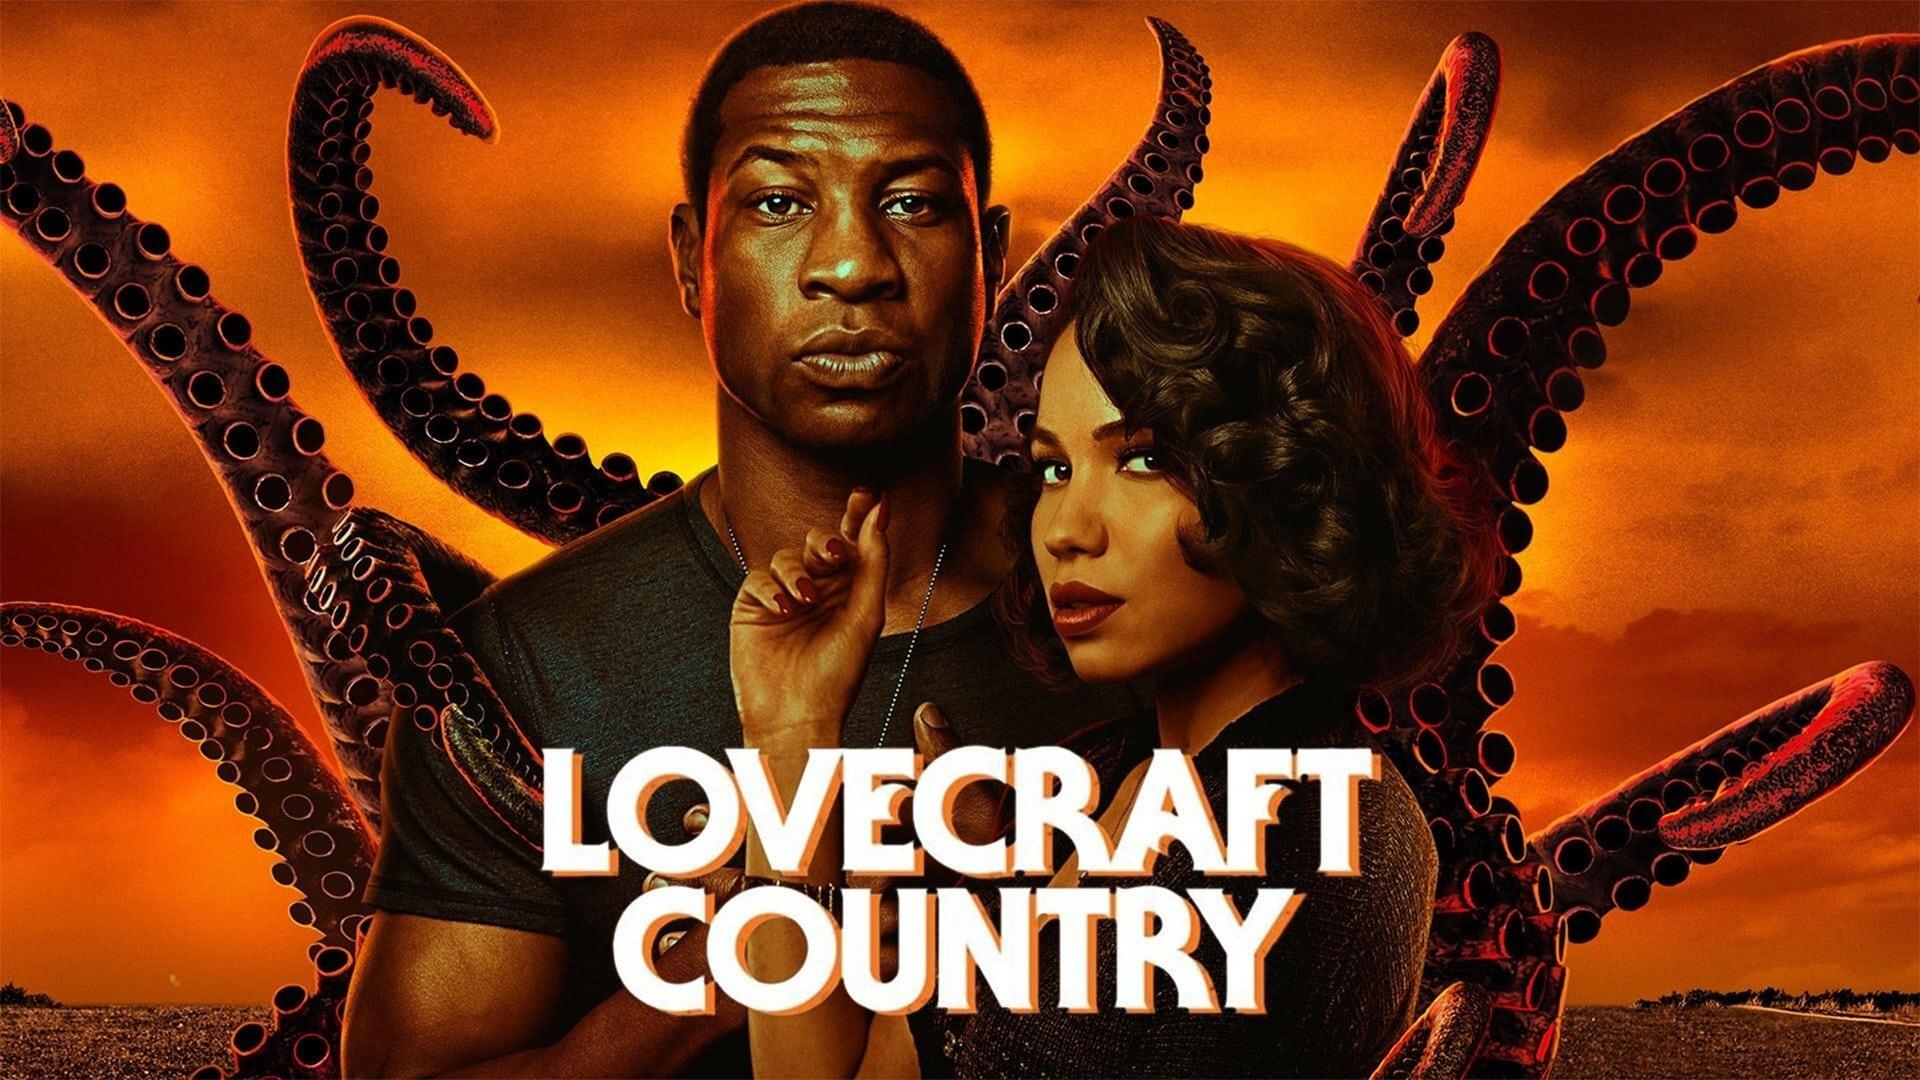 Lovecraft Country Season 1 Episode 5